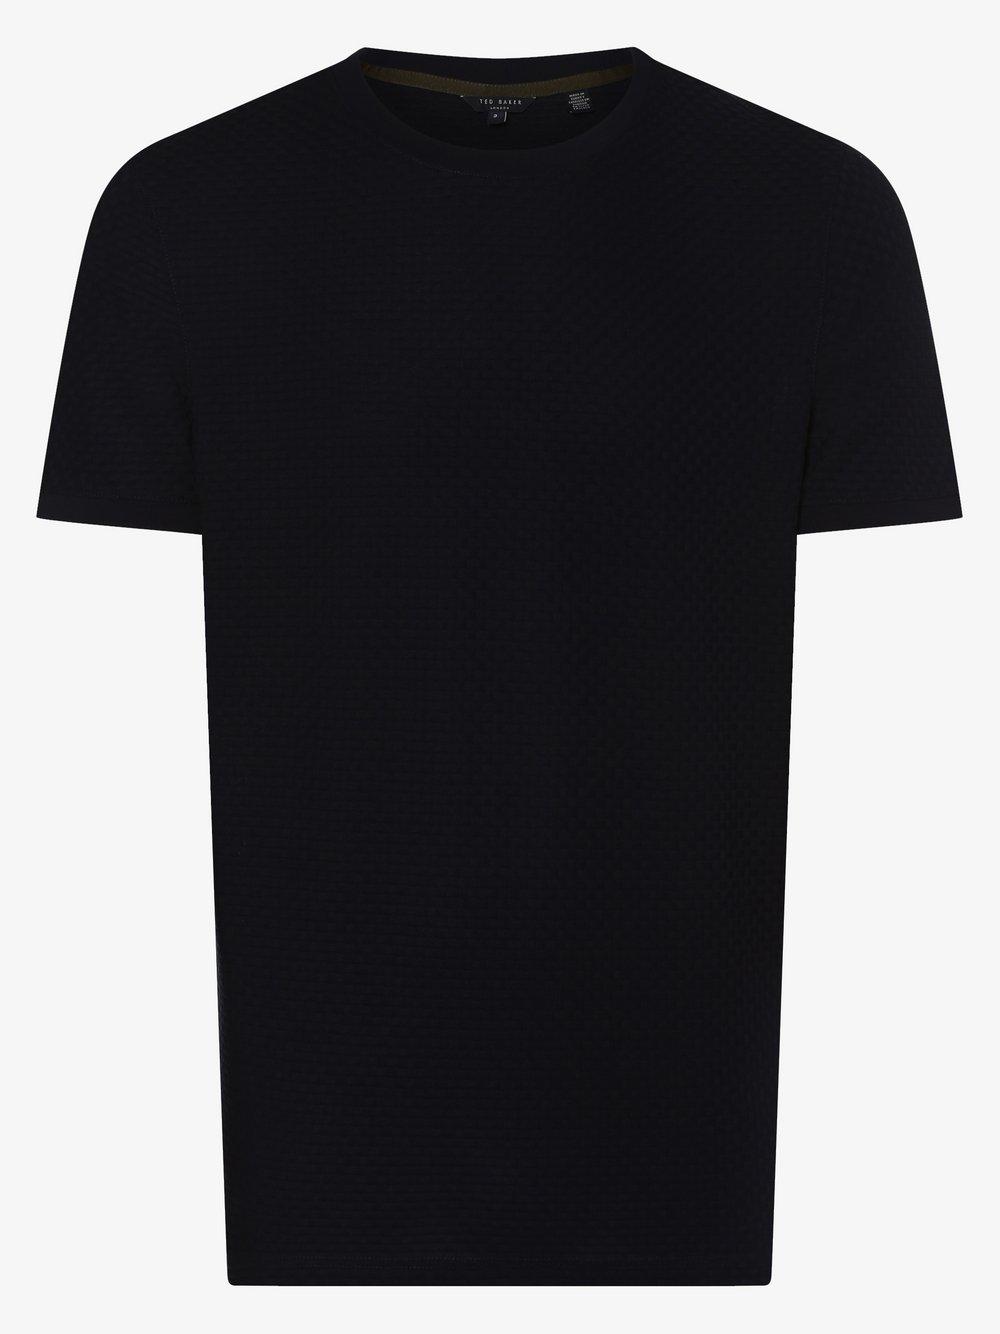 Ted Baker – T-shirt męski – Caramel, niebieski Van Graaf 463318-0003